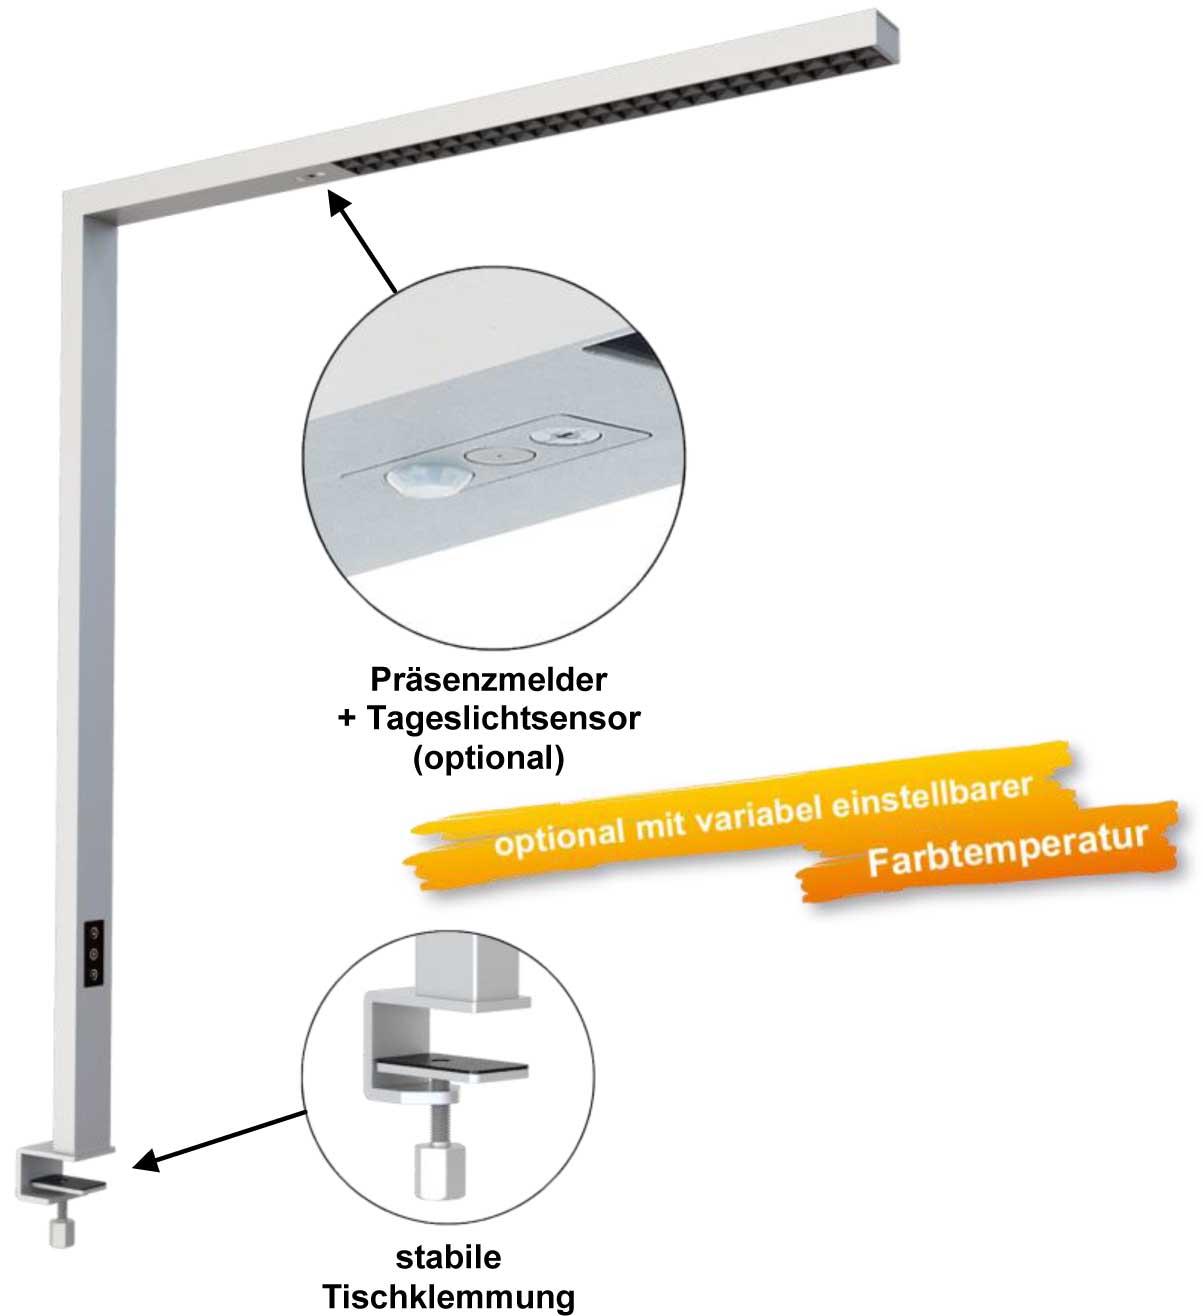 LEDAXO LED-Arbeitsplatzleuchte AL-06 mit stabiler Tischklemmung